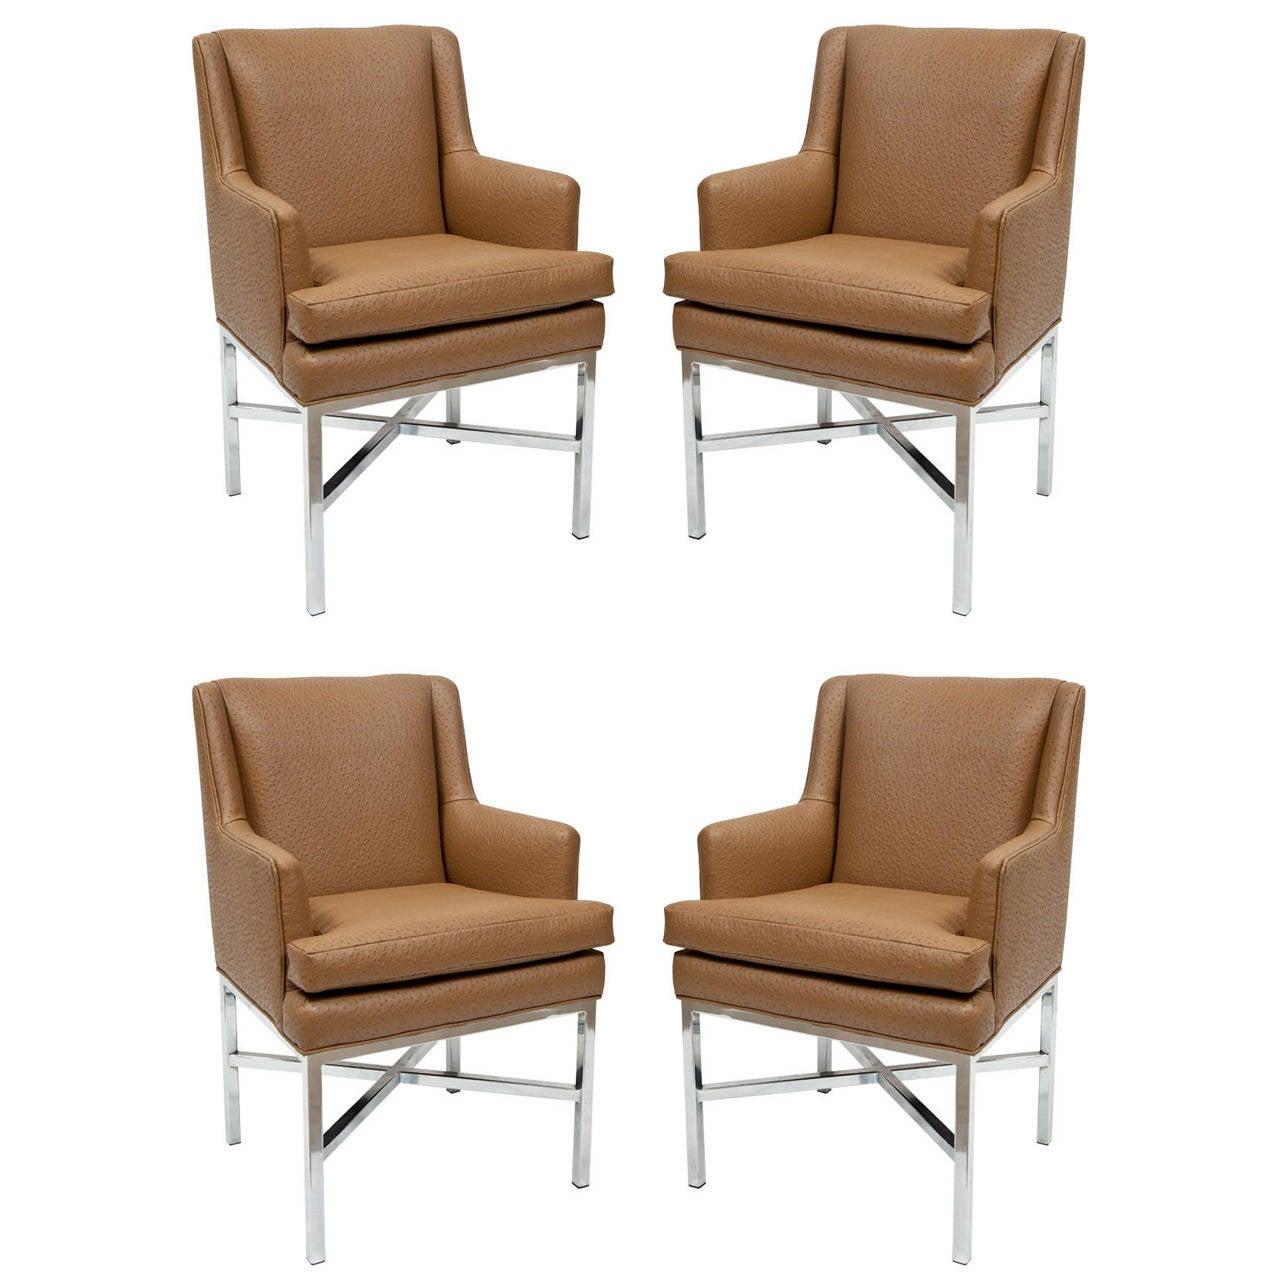 Set of Four Milo Baughman Armchairs